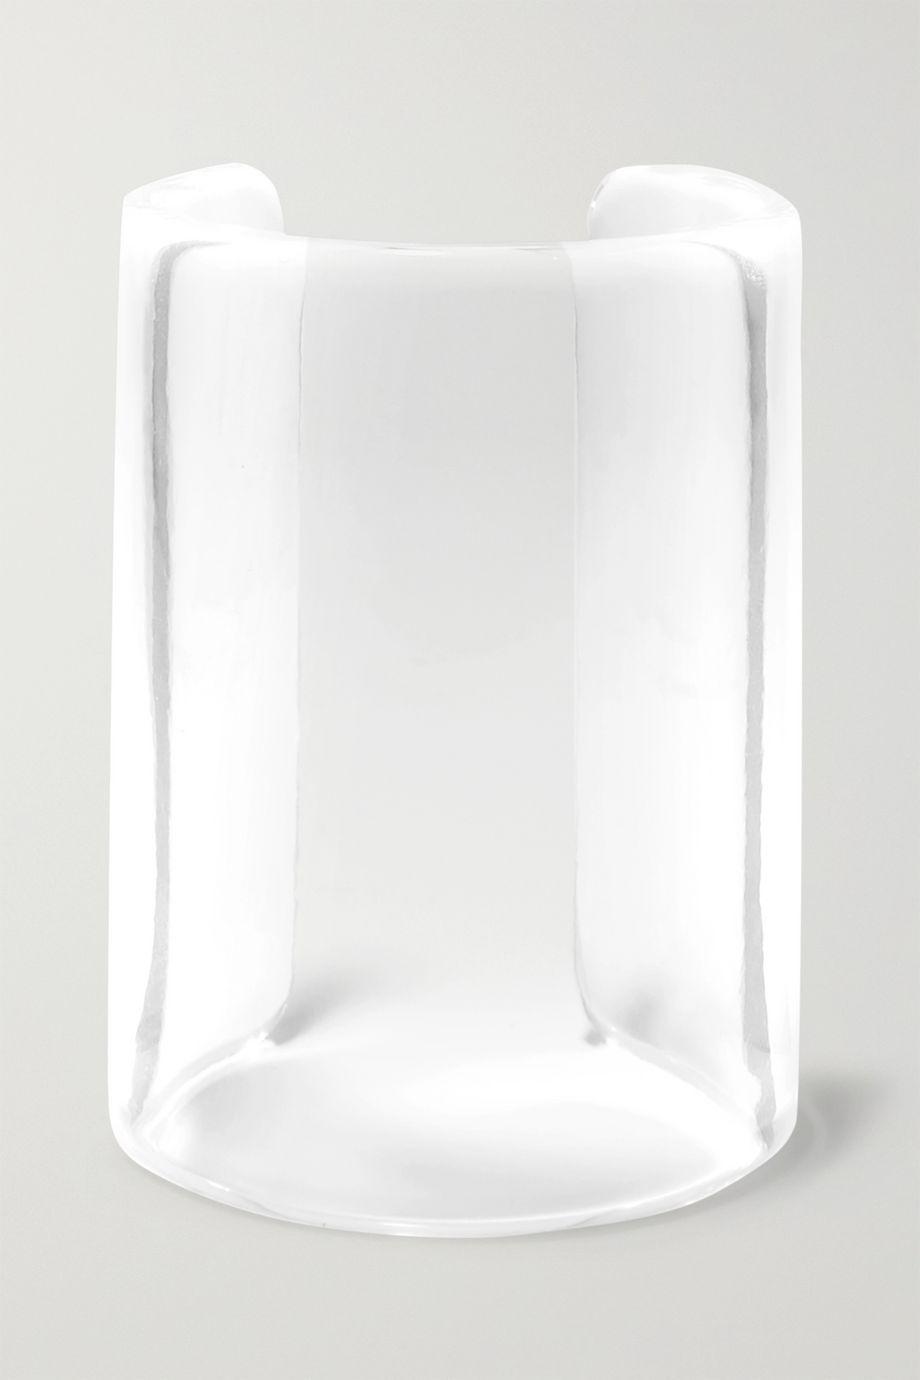 Dries Van Noten Perspex cuff